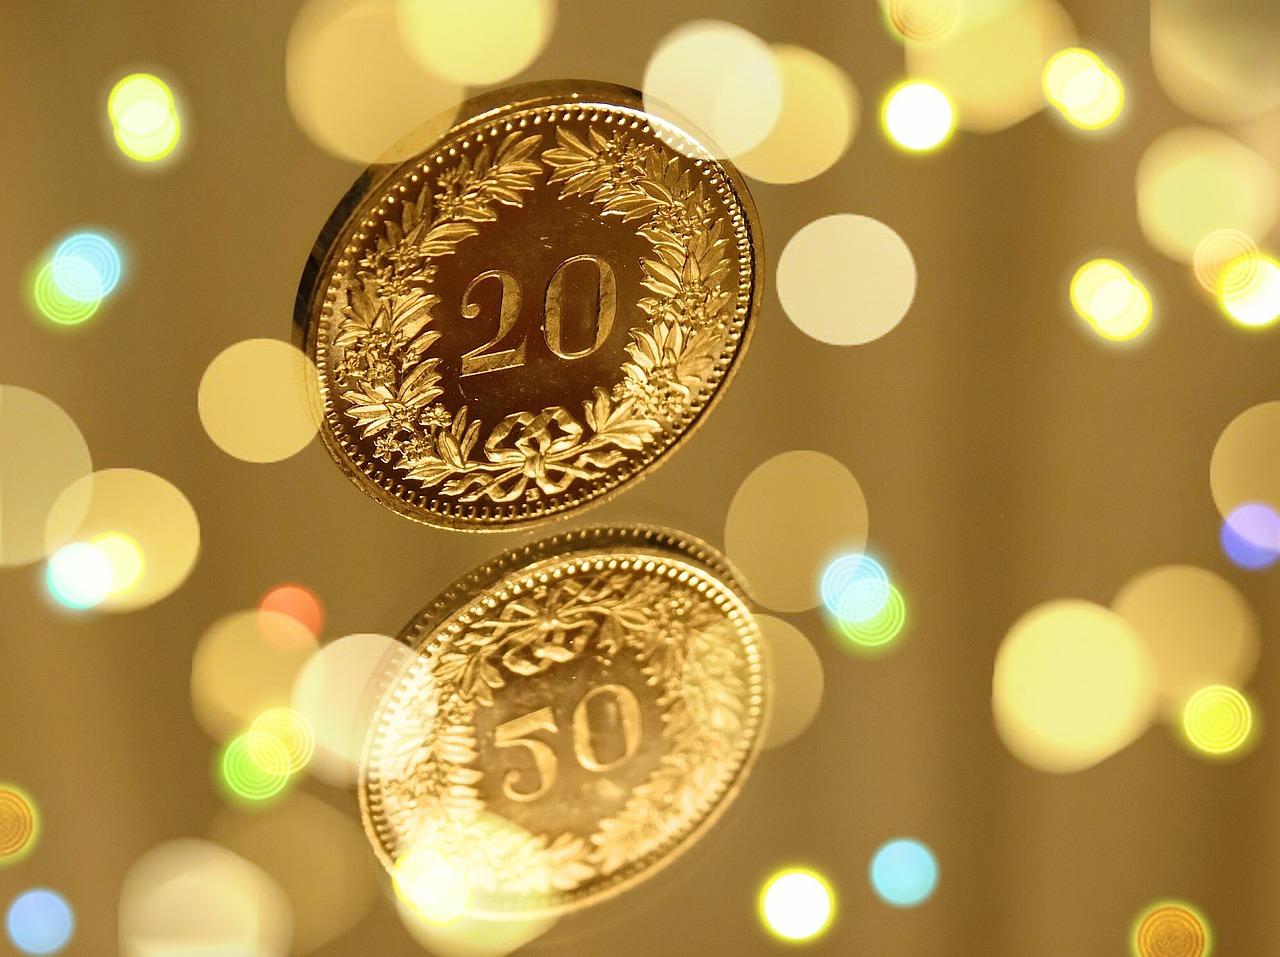 Аналитика и прогноз по валютным парам Форекс на завтра 24 июня